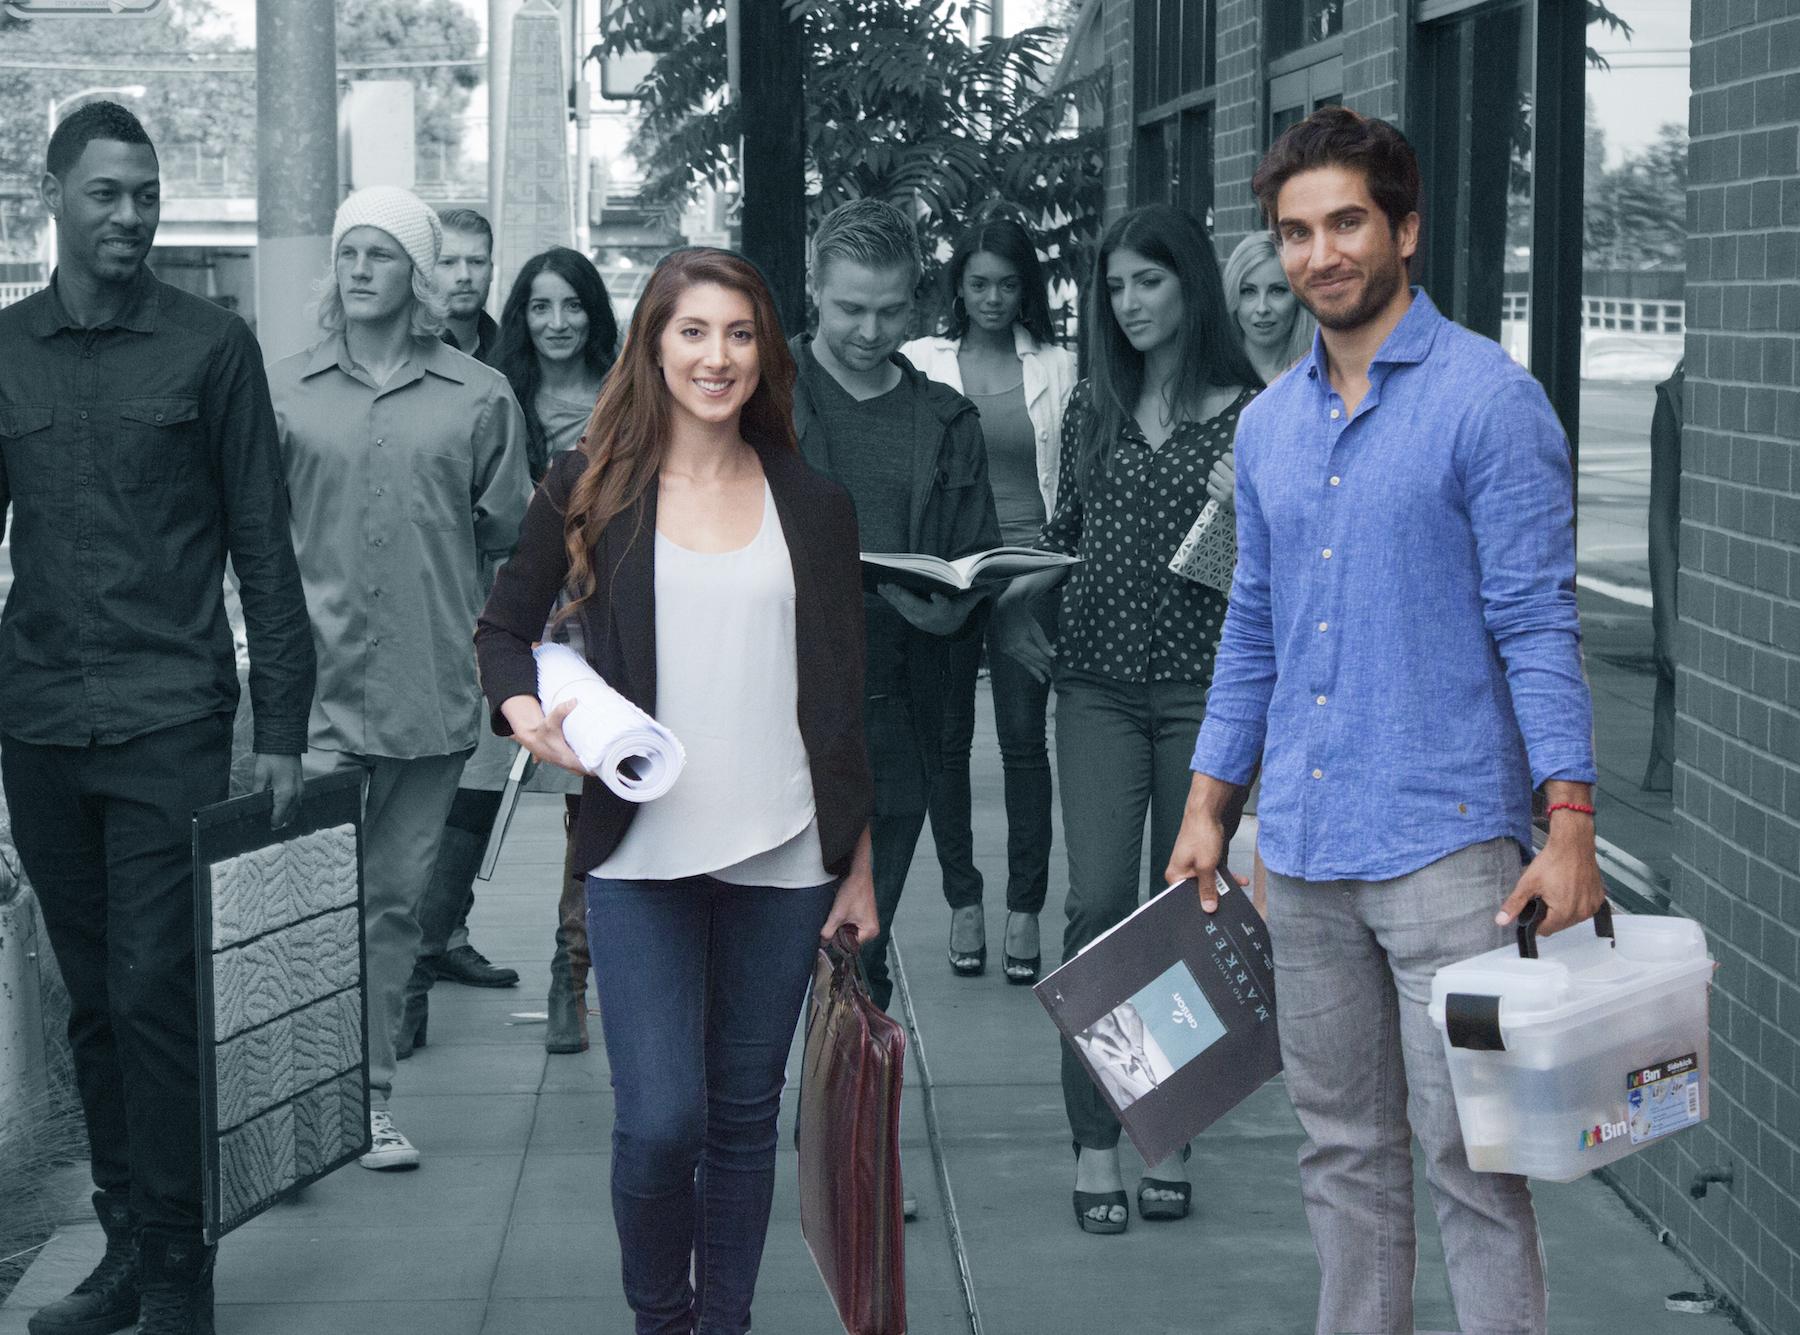 Students walking smiling